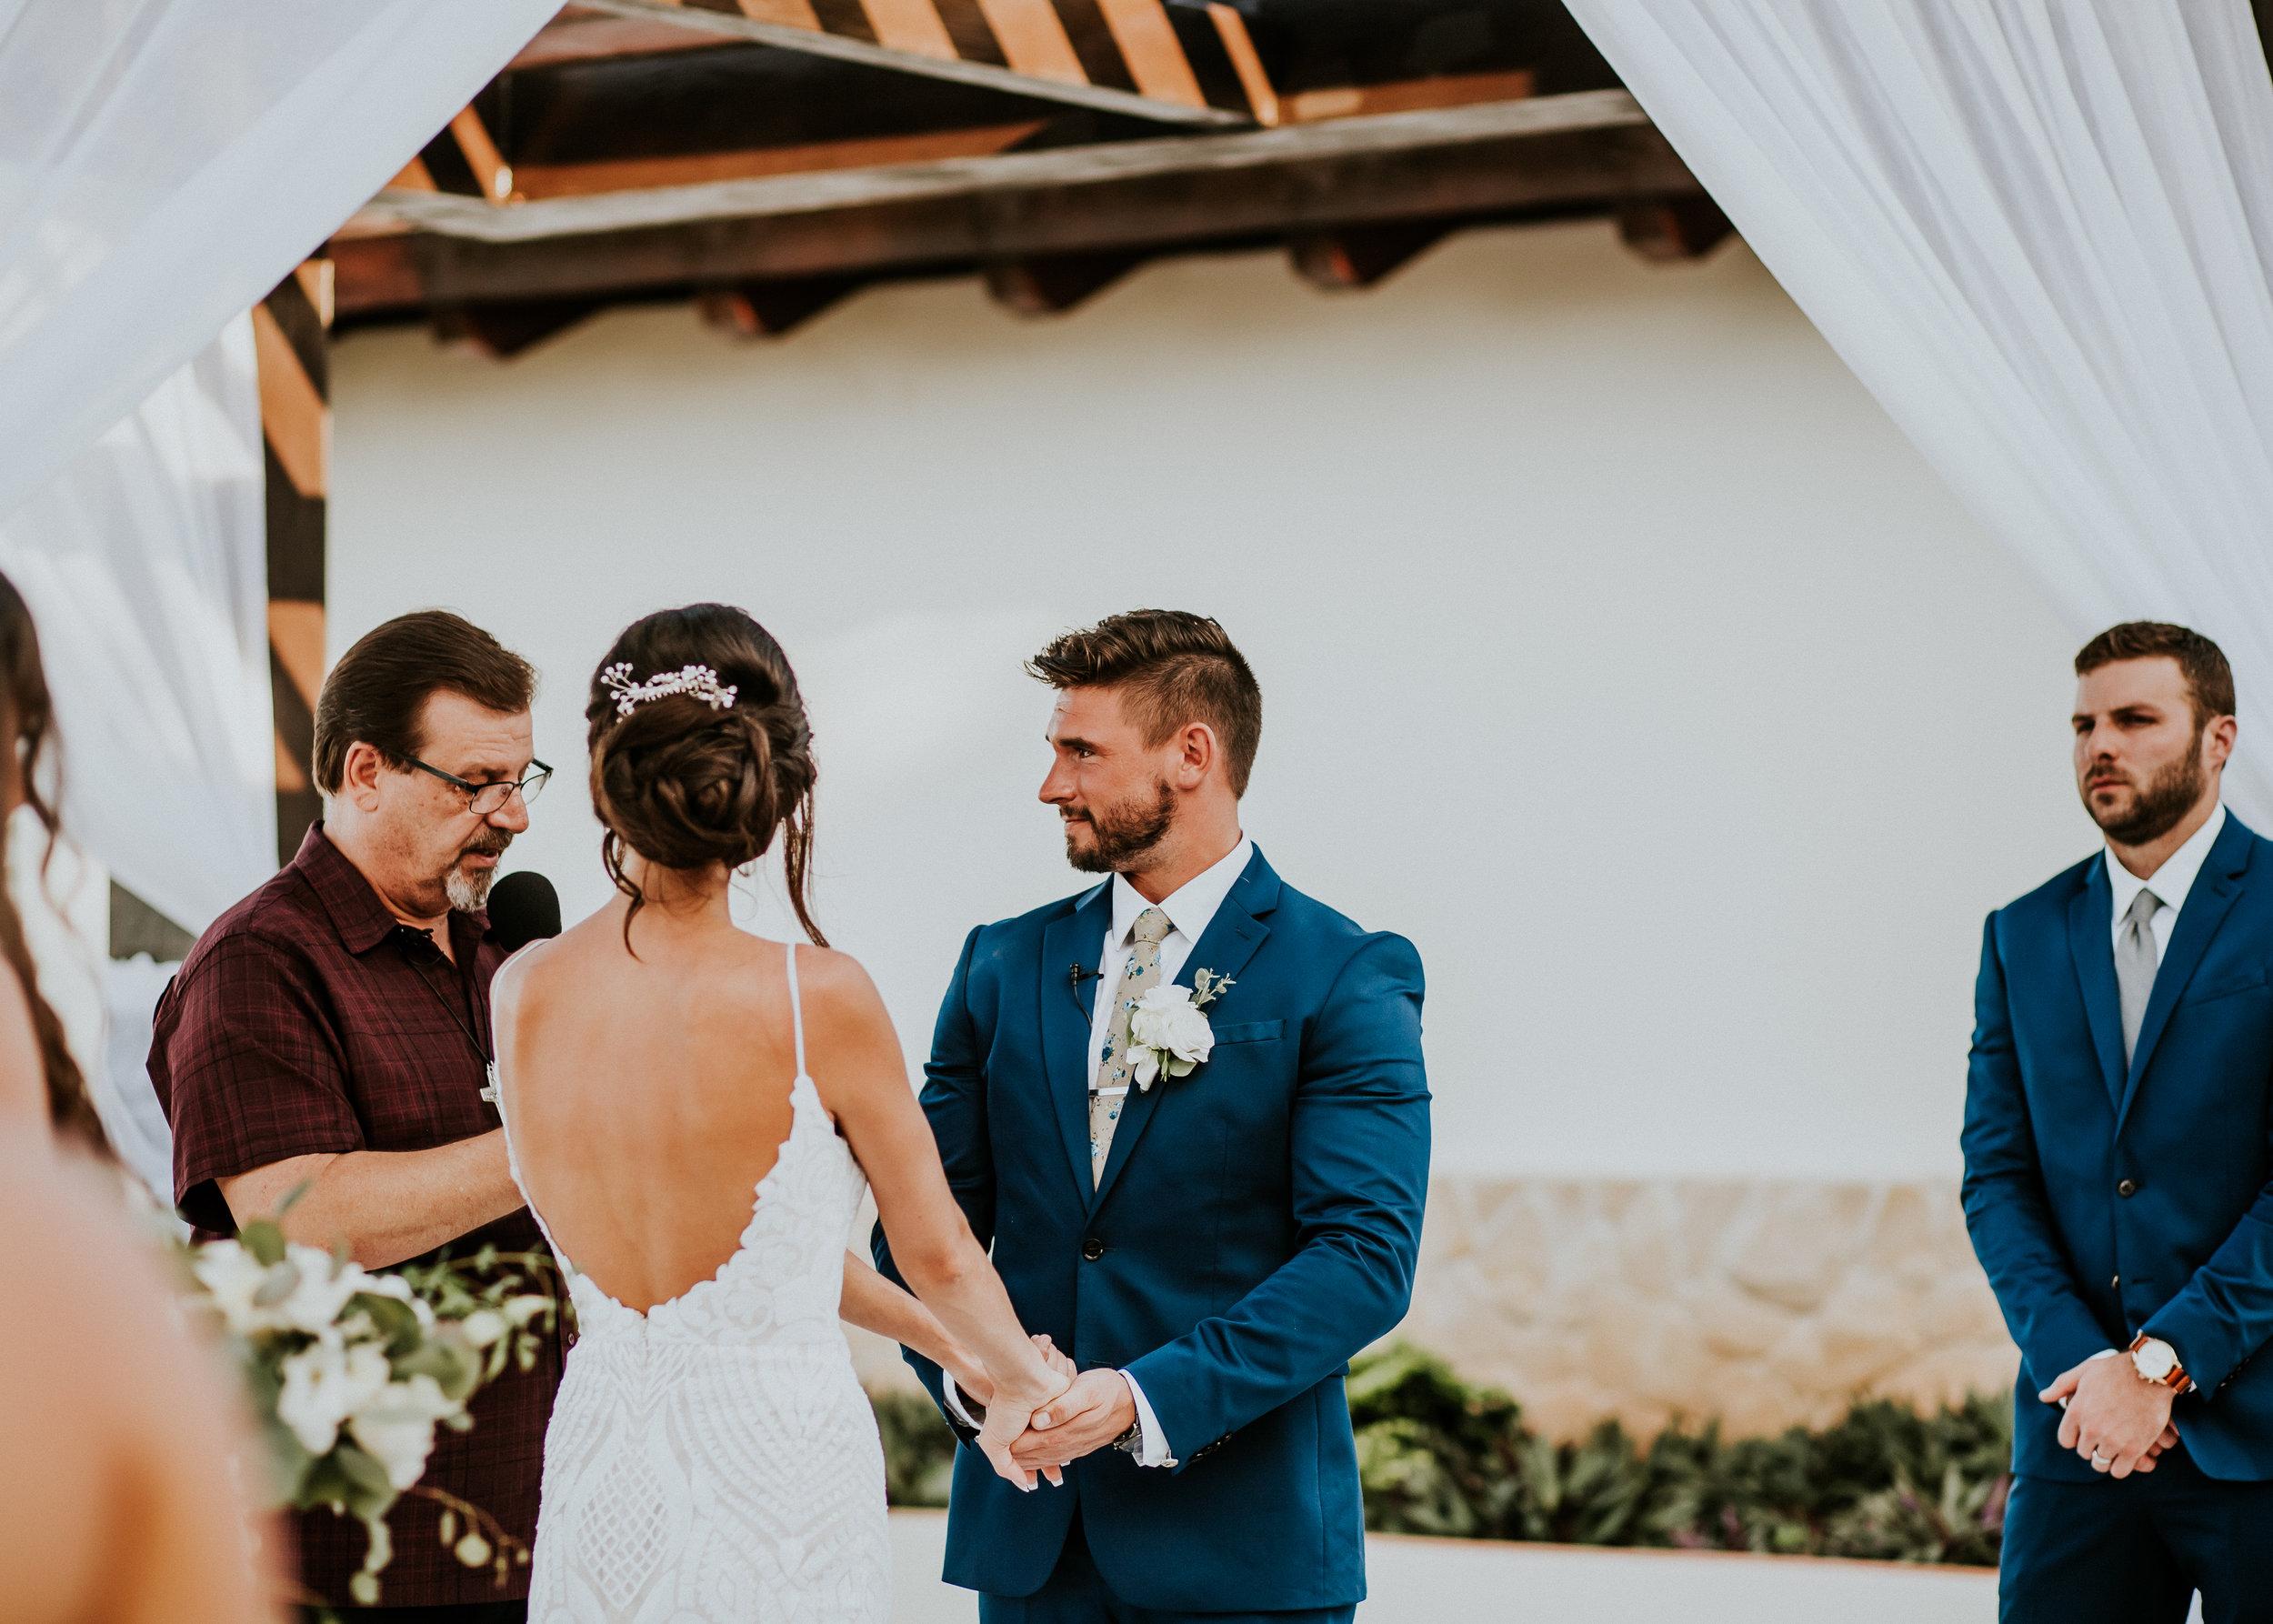 WeddingDay-187.jpg